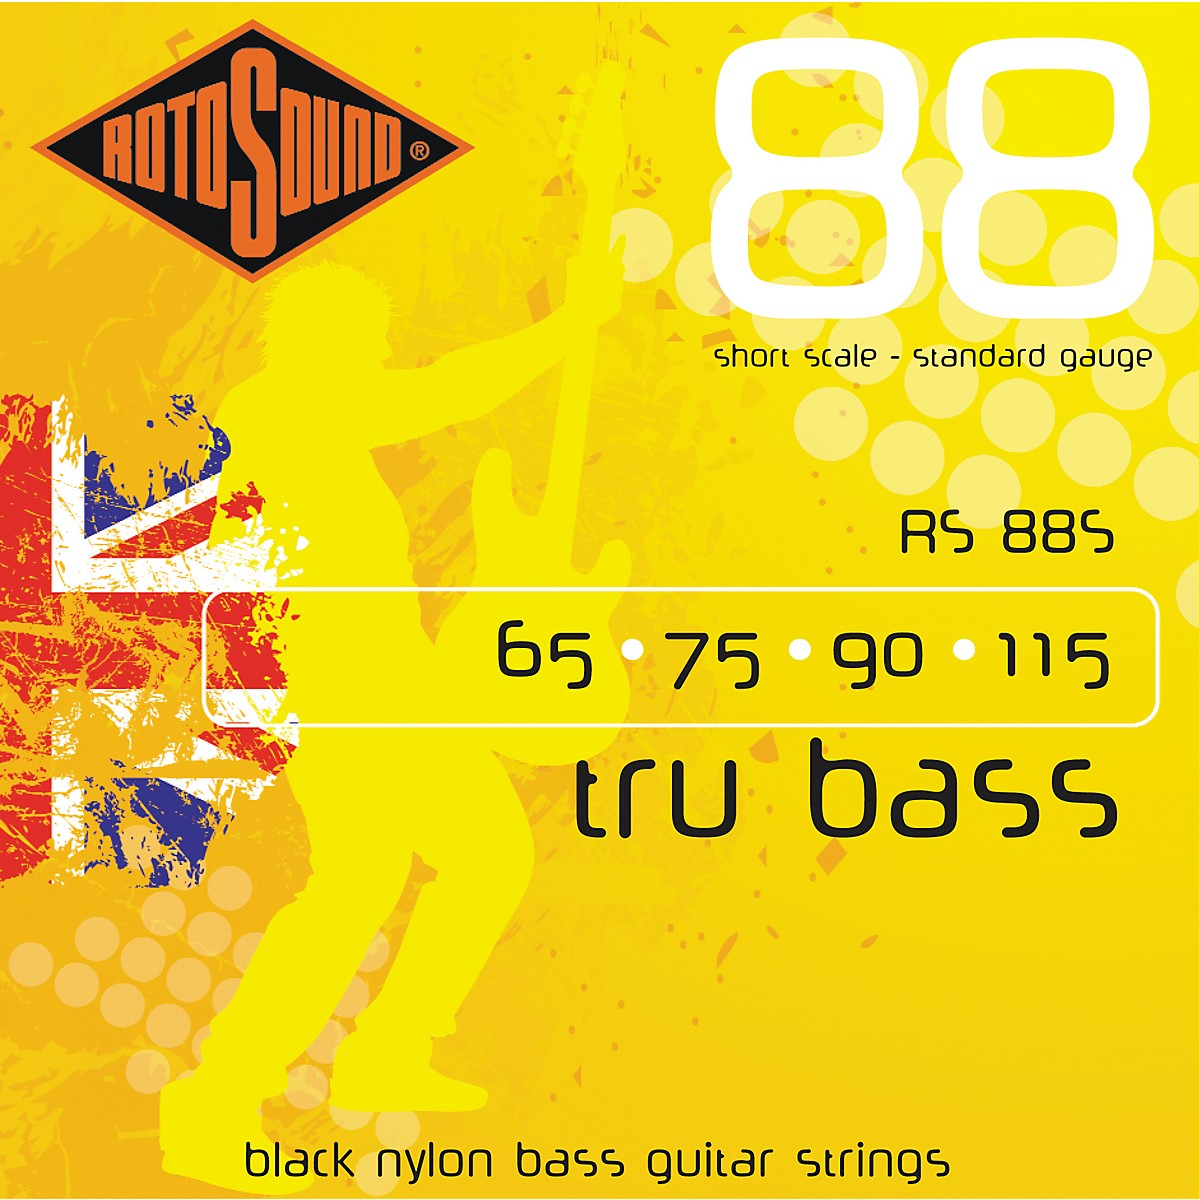 Rotosound RS88S Trubass Black Nylon Flatwound Standard Gauge Short Scale Bass Strings